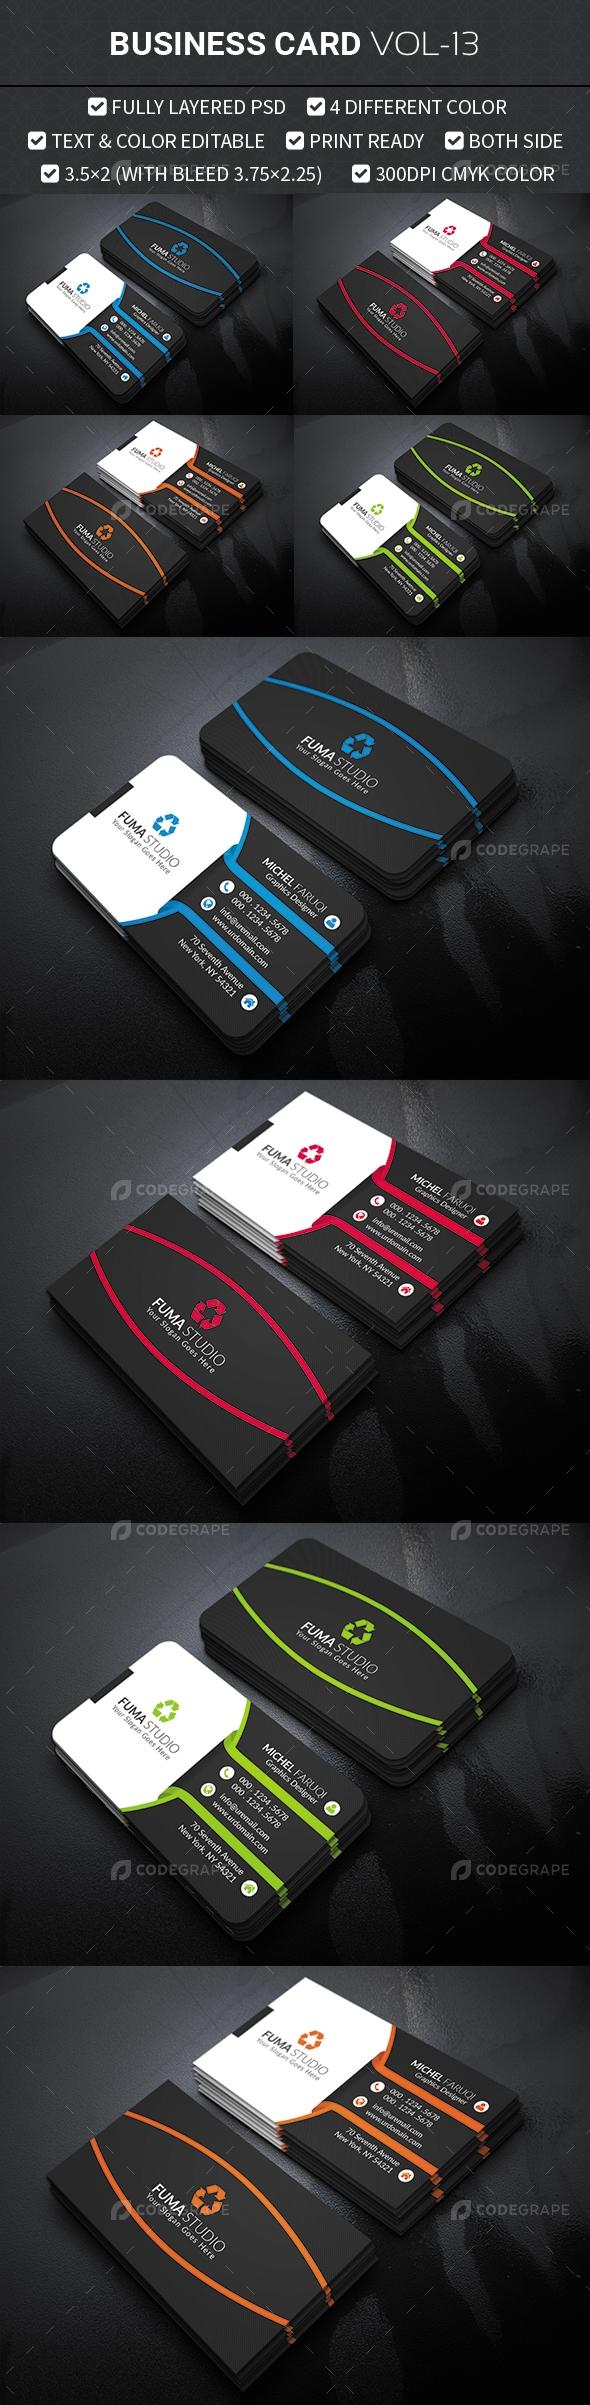 Business Card Vol-13